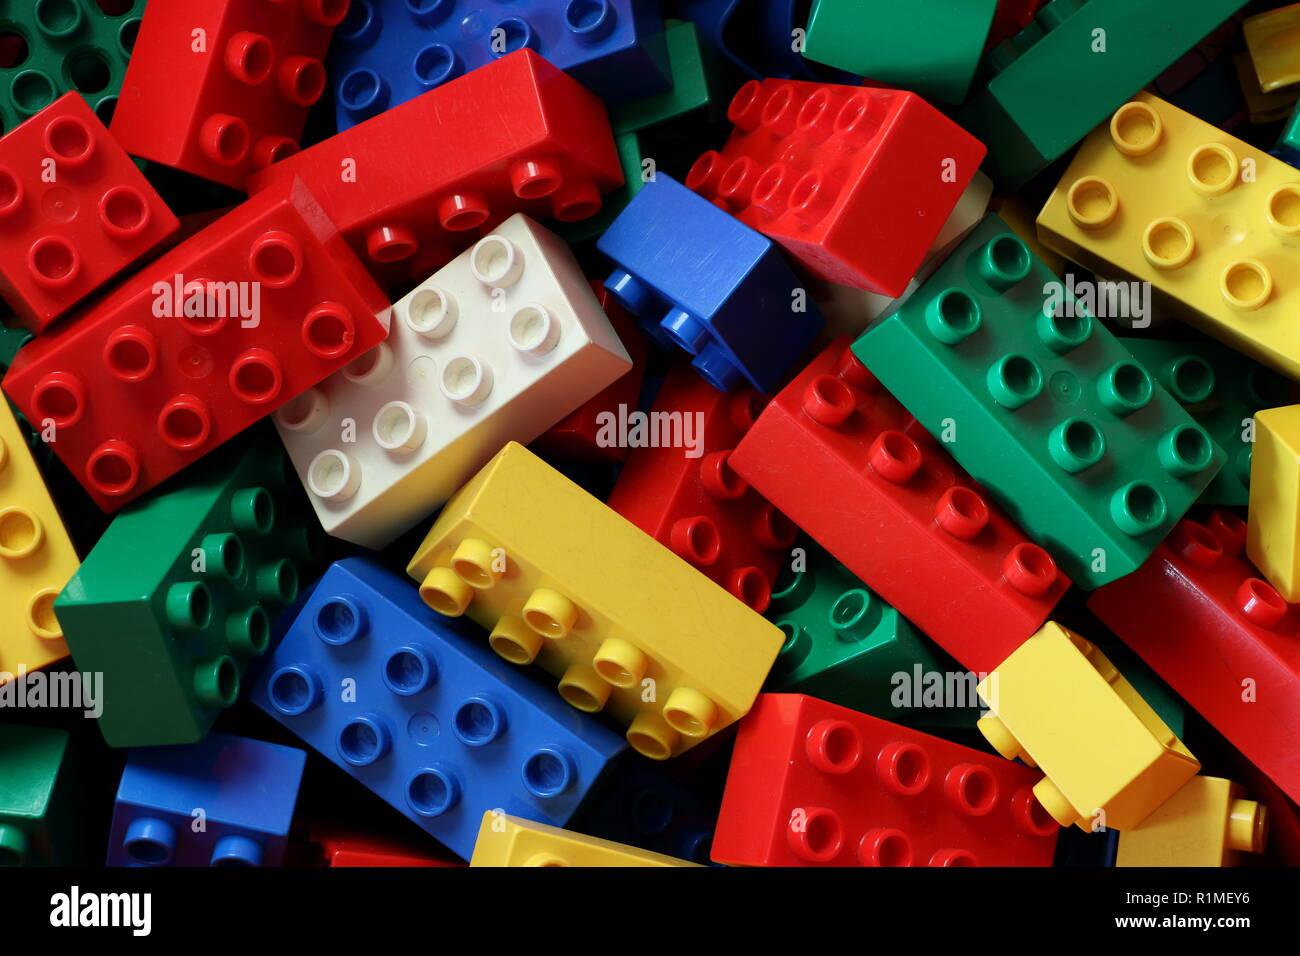 Lego Blocks Stock Photos & Lego Blocks Stock Images - Alamy